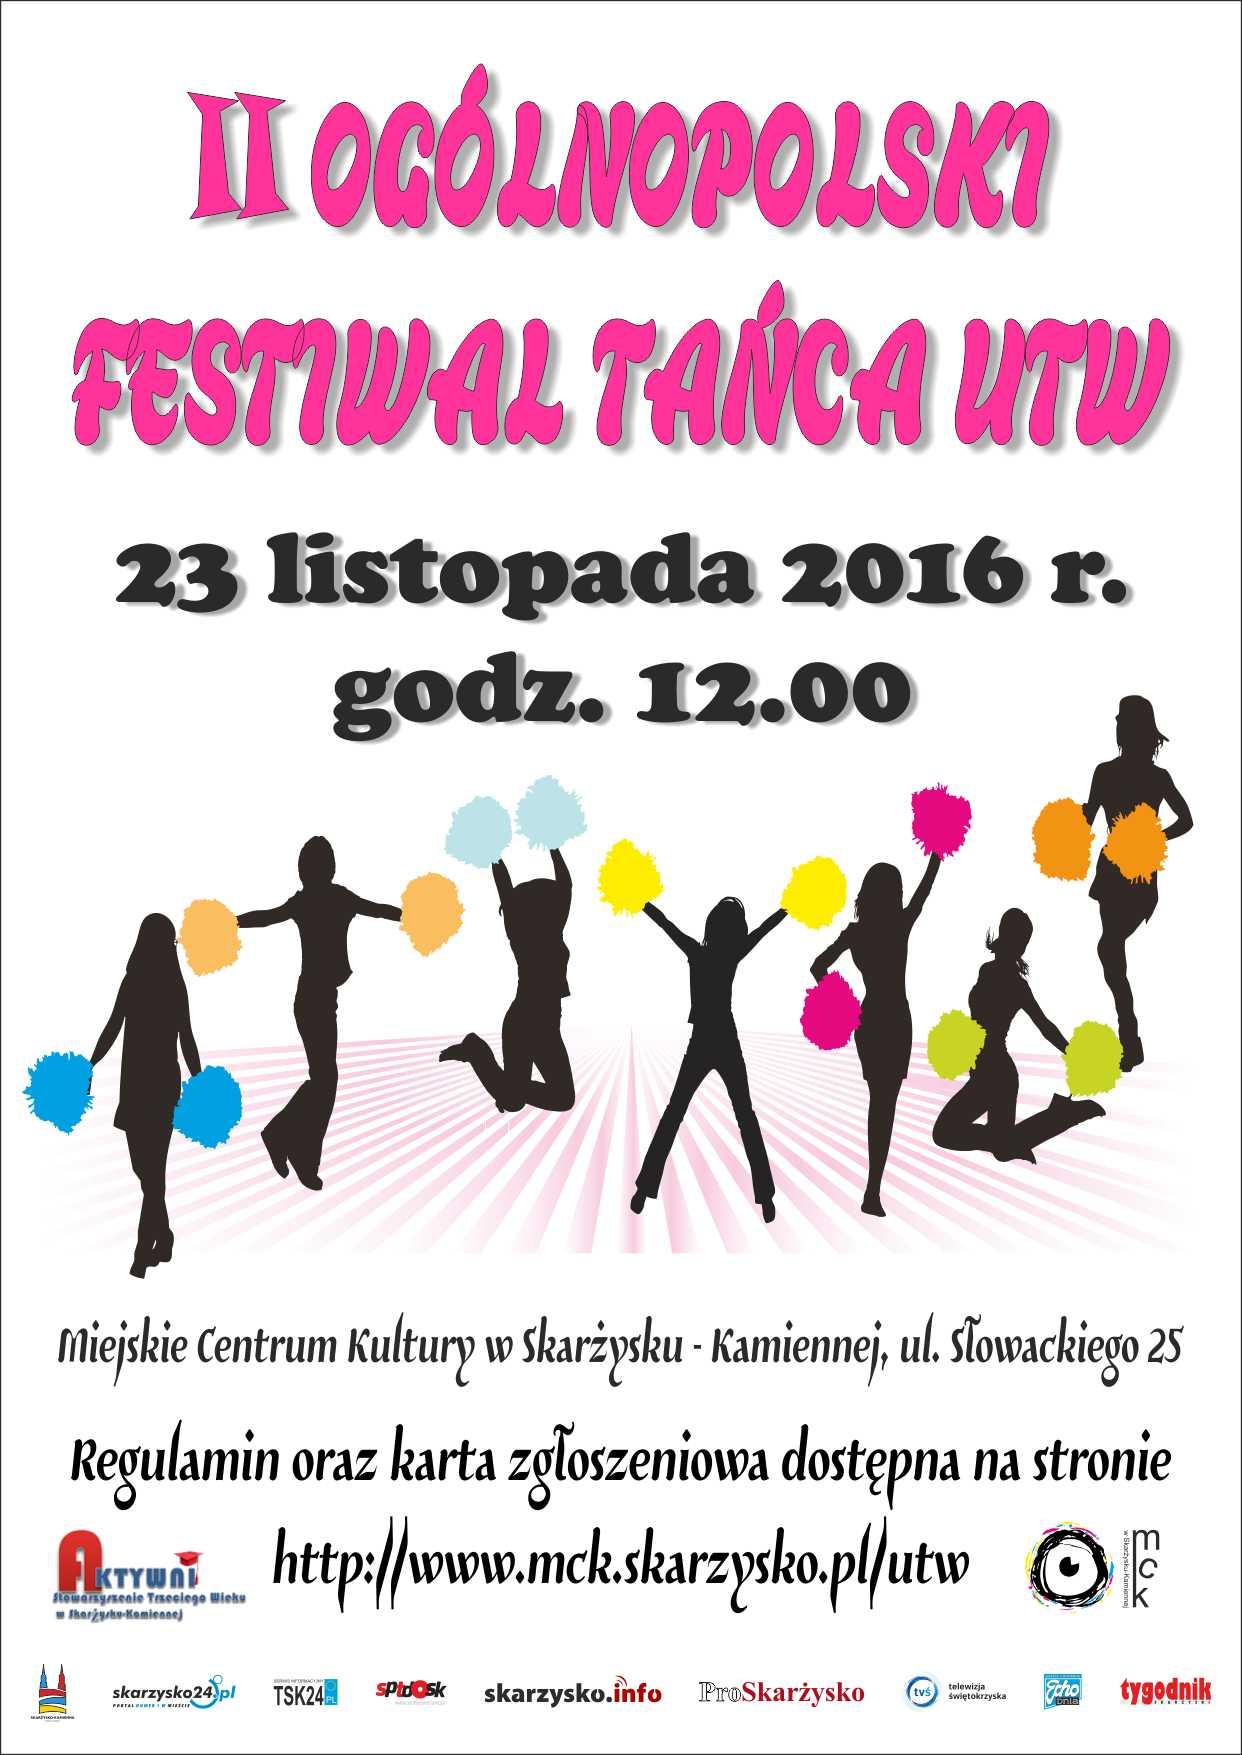 ii_festiwal_tanca_utw